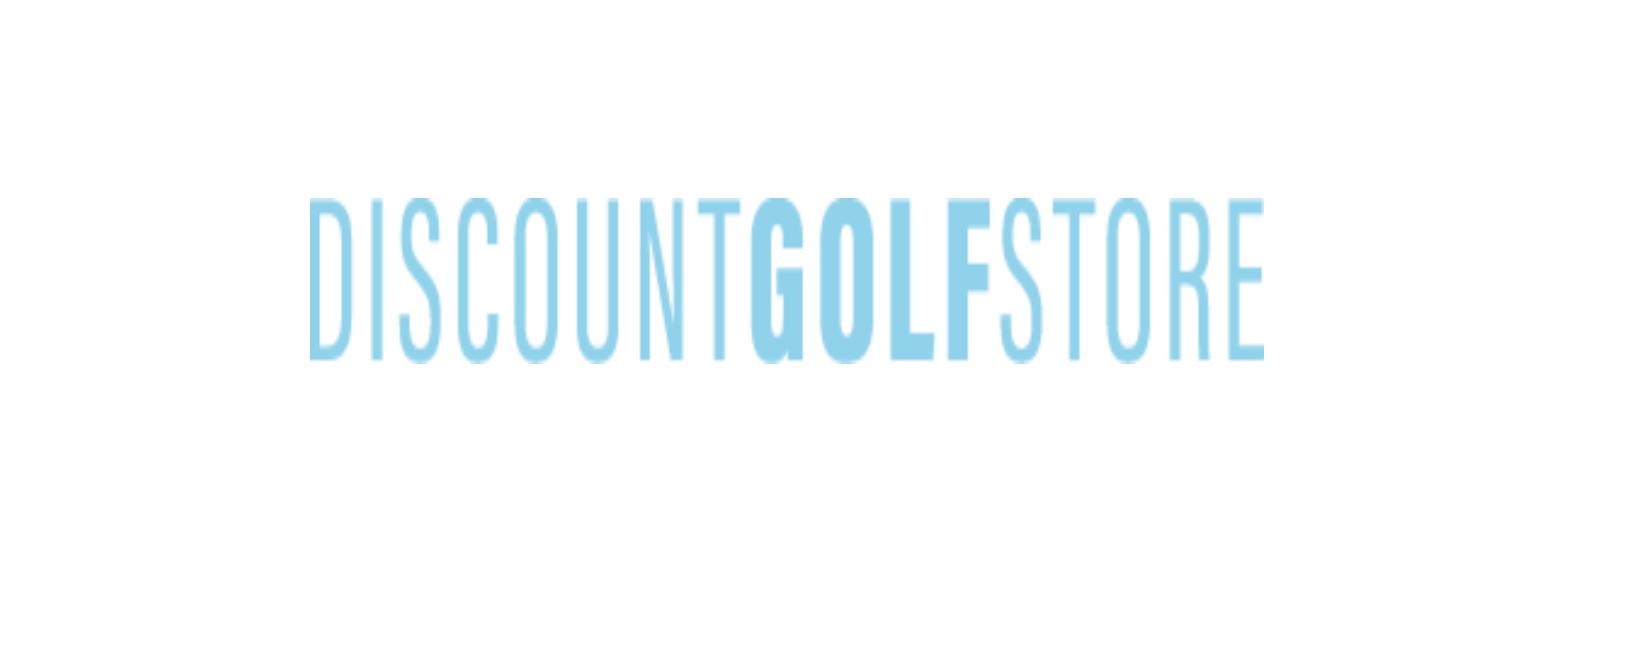 Discount Golf Store UK Discount Code 2021